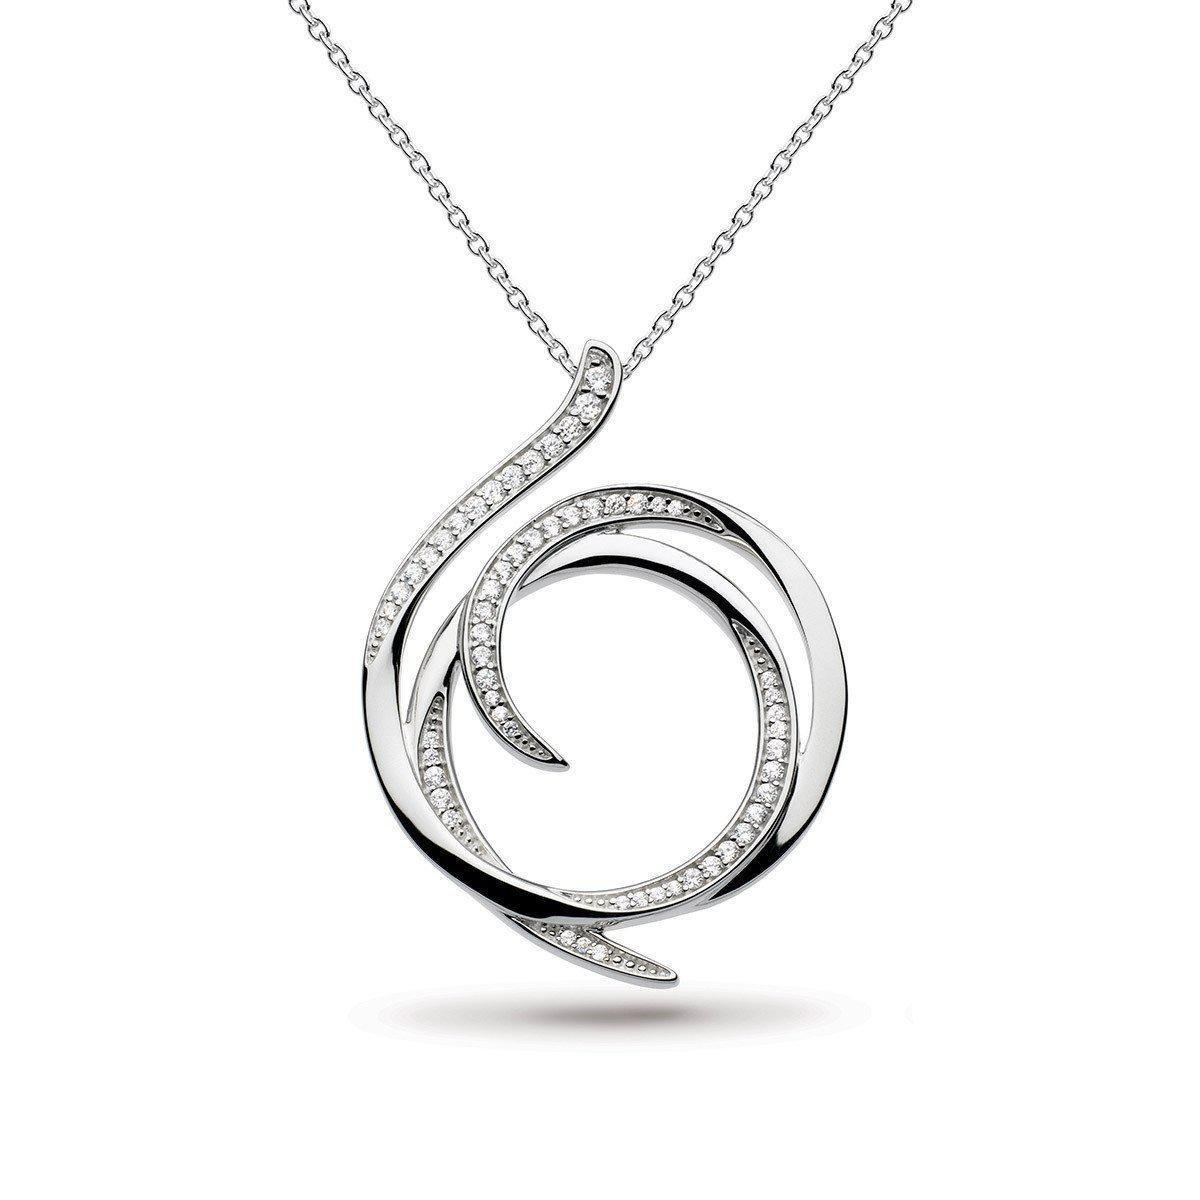 Kit Heath Twine Helix Pave Necklace ONHaC2Wc